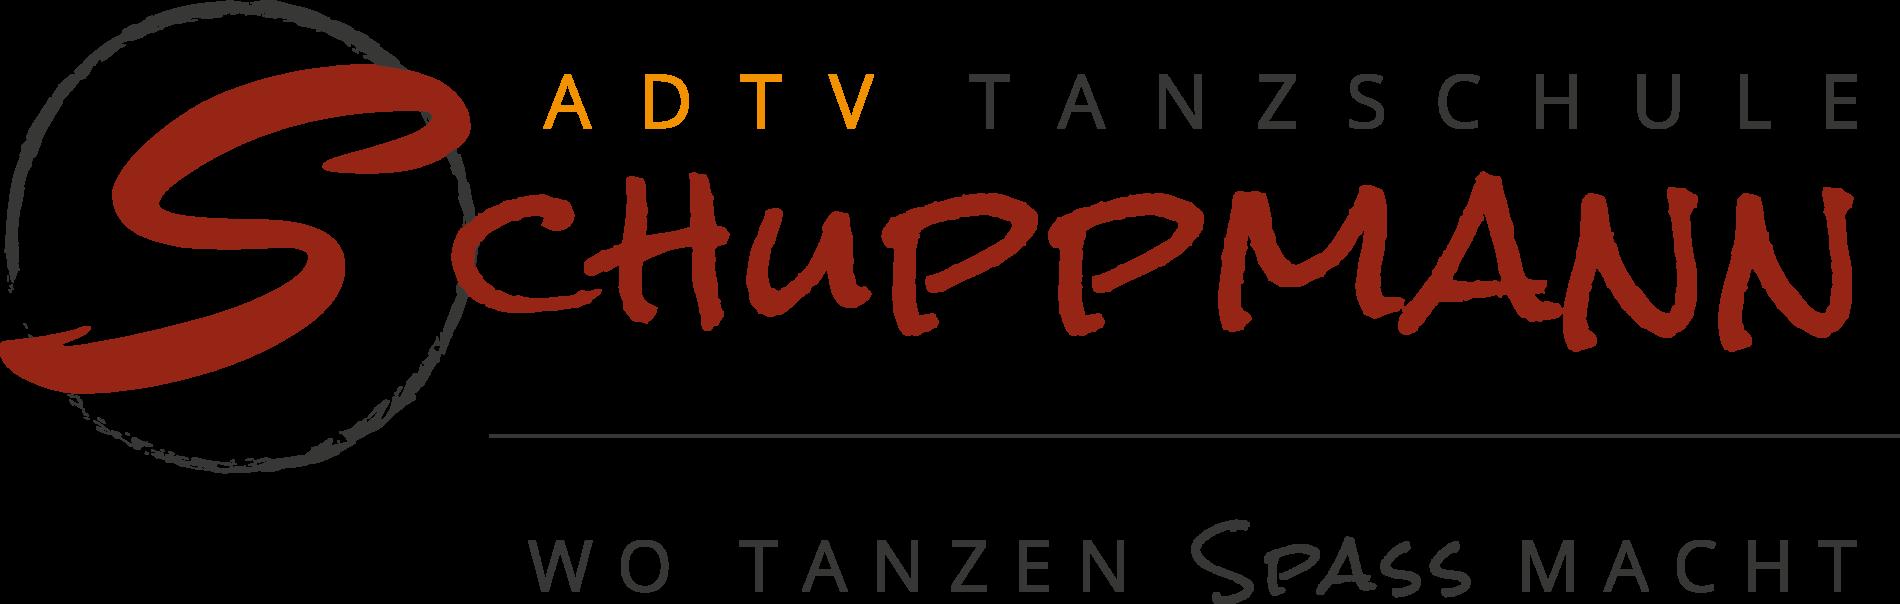 Tanzschule Schuppmann - Tanzen in Alfeld, wo Tanzen Spaß macht